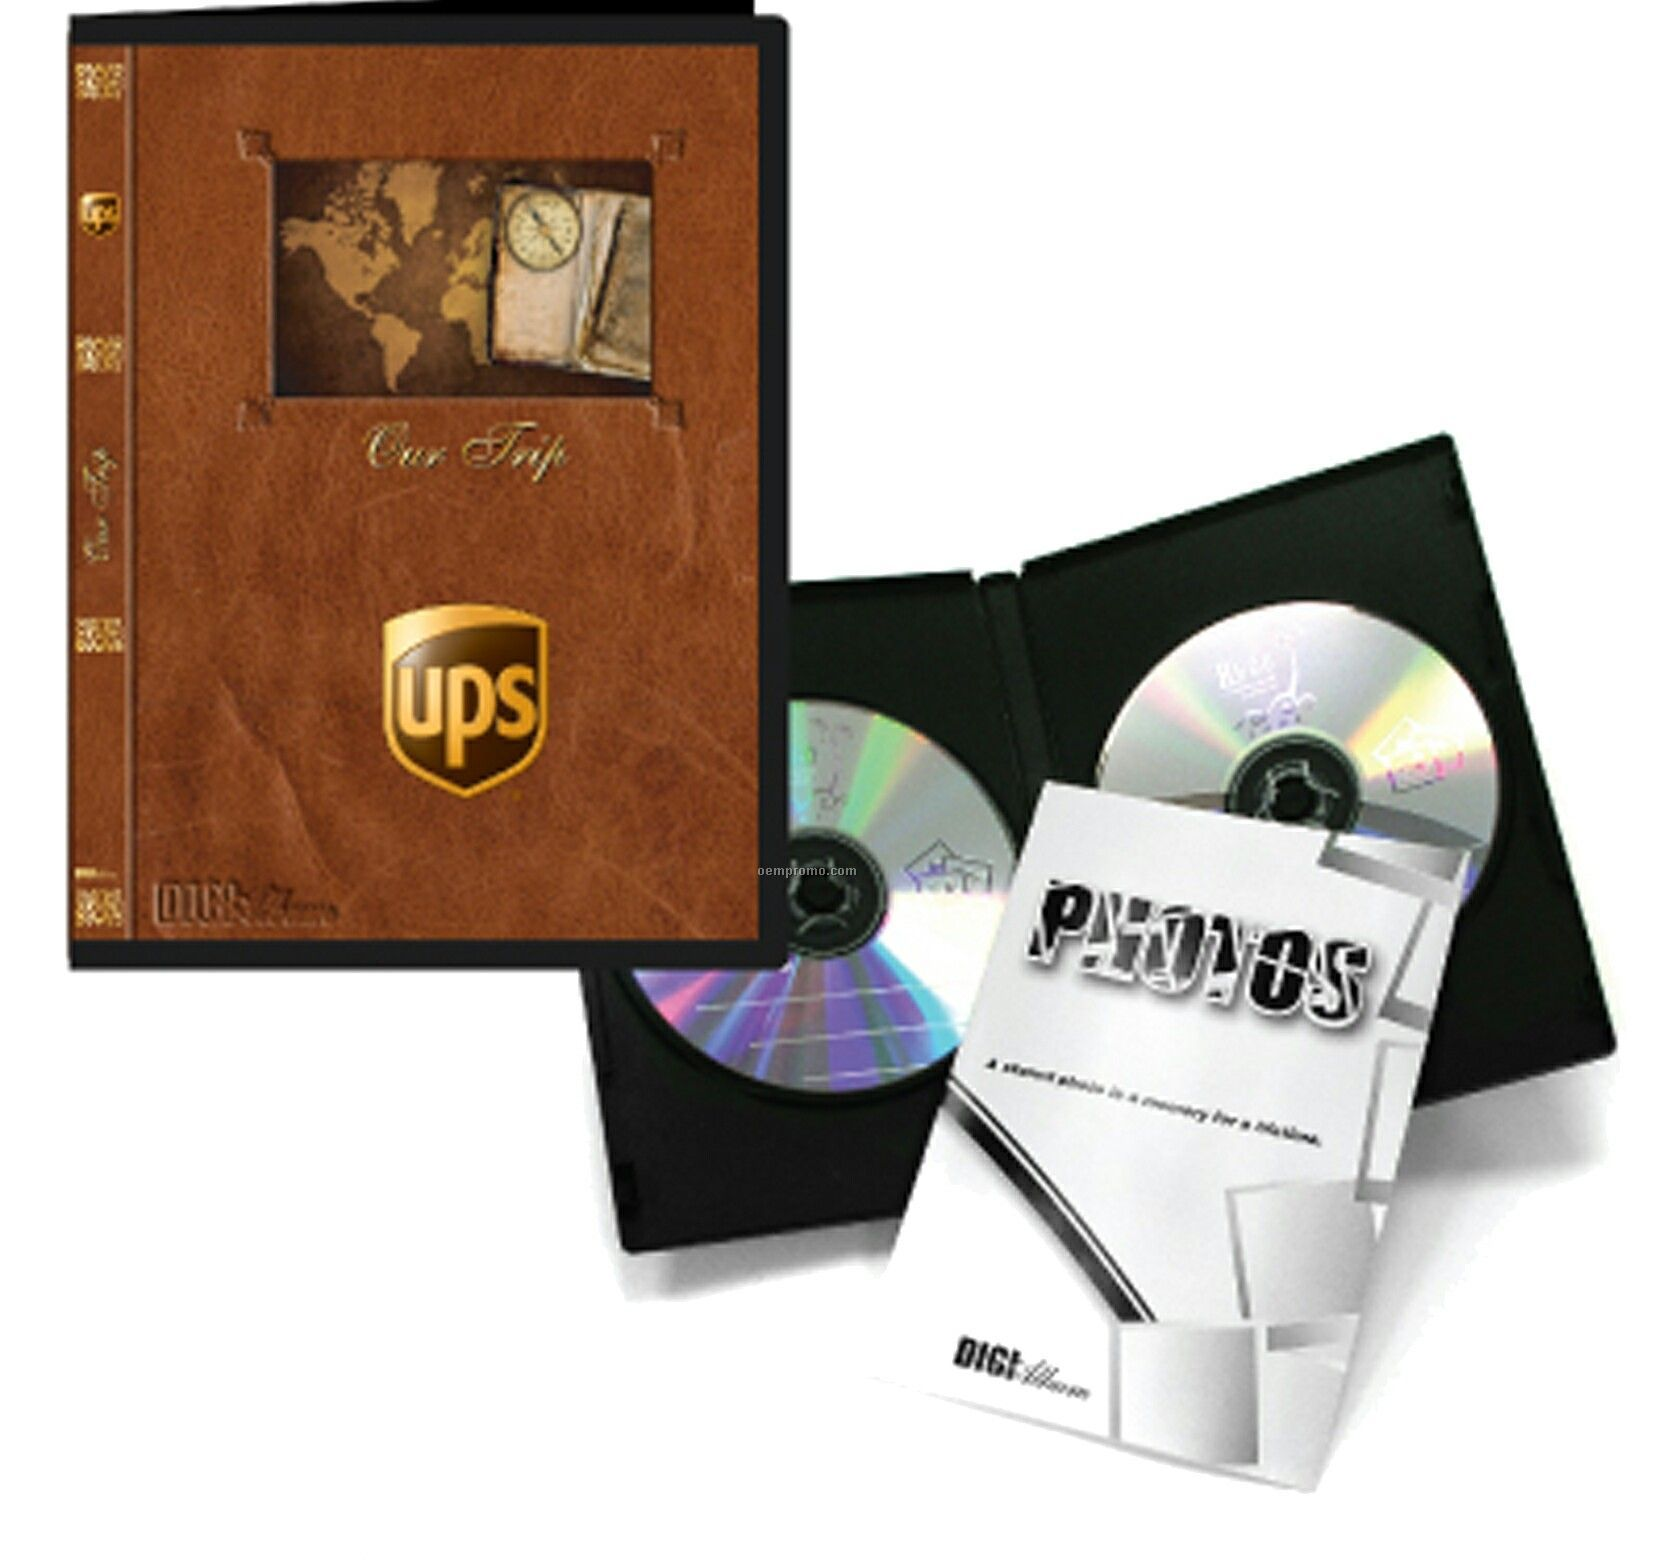 Digi-albums - CD-R Edition